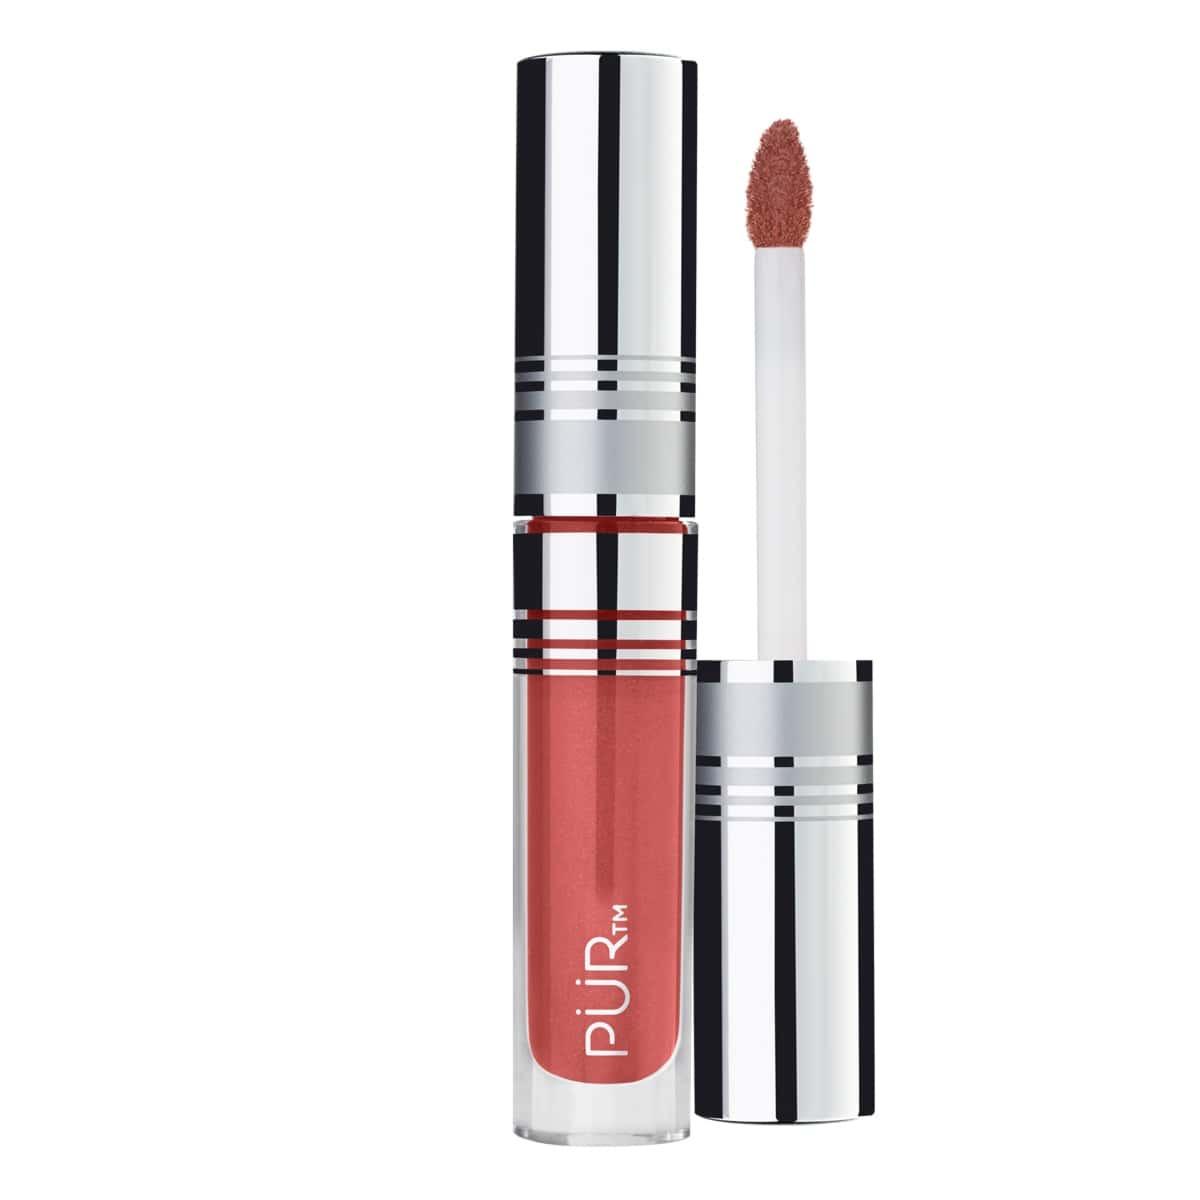 Chrome Glaze High-Shine Lip Gloss in Arm Candy